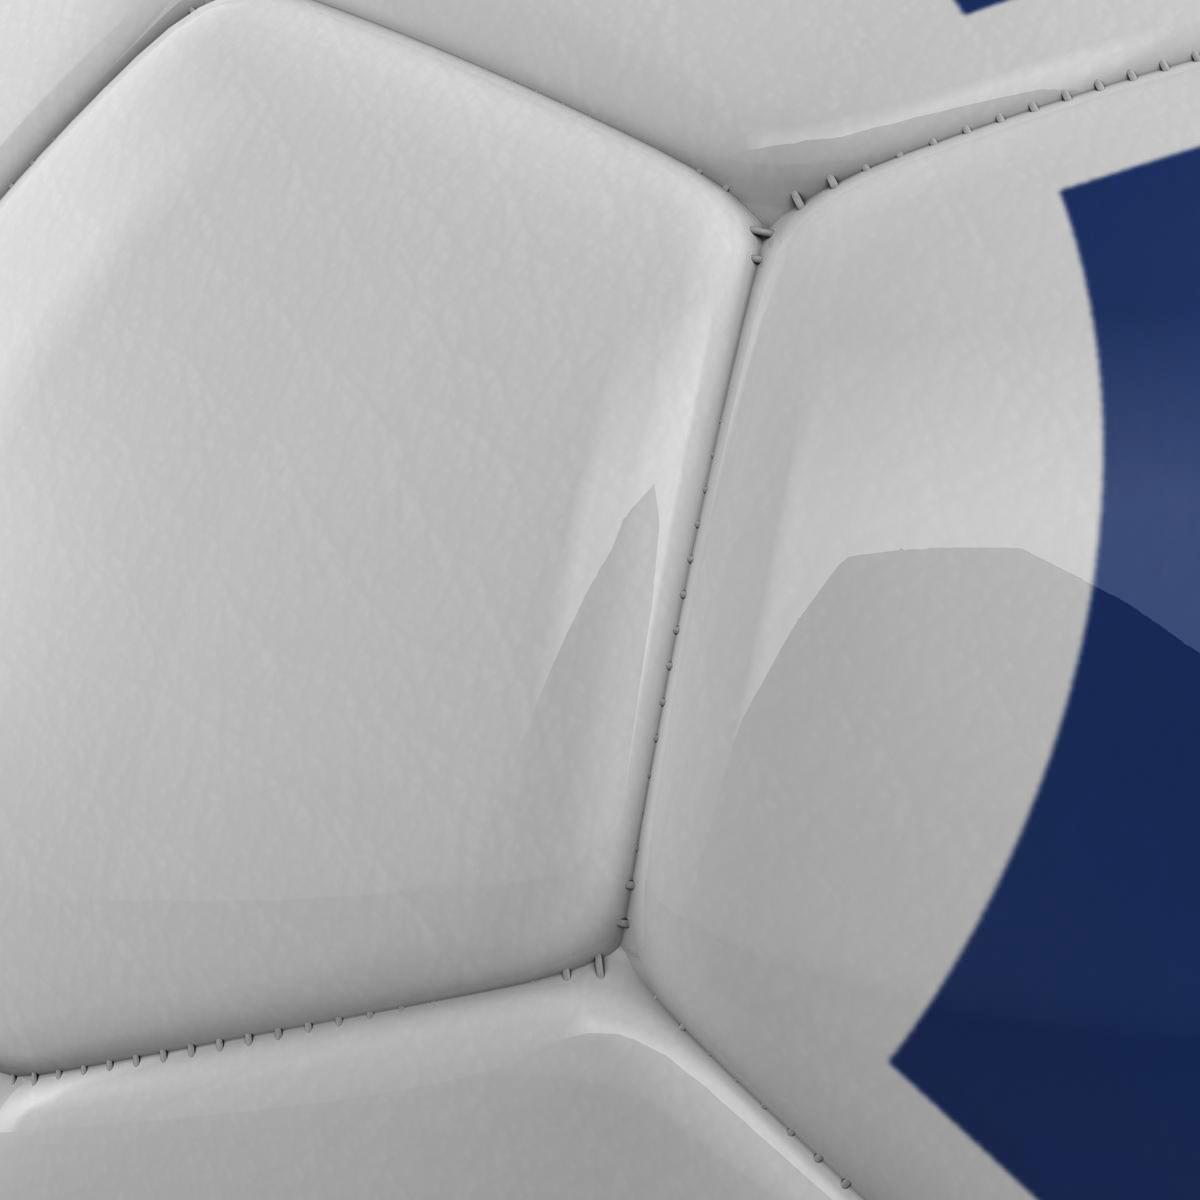 soccerball цэнхэр цагаан 3d загвар 3ds max fbx c4d ma mb obj 203986